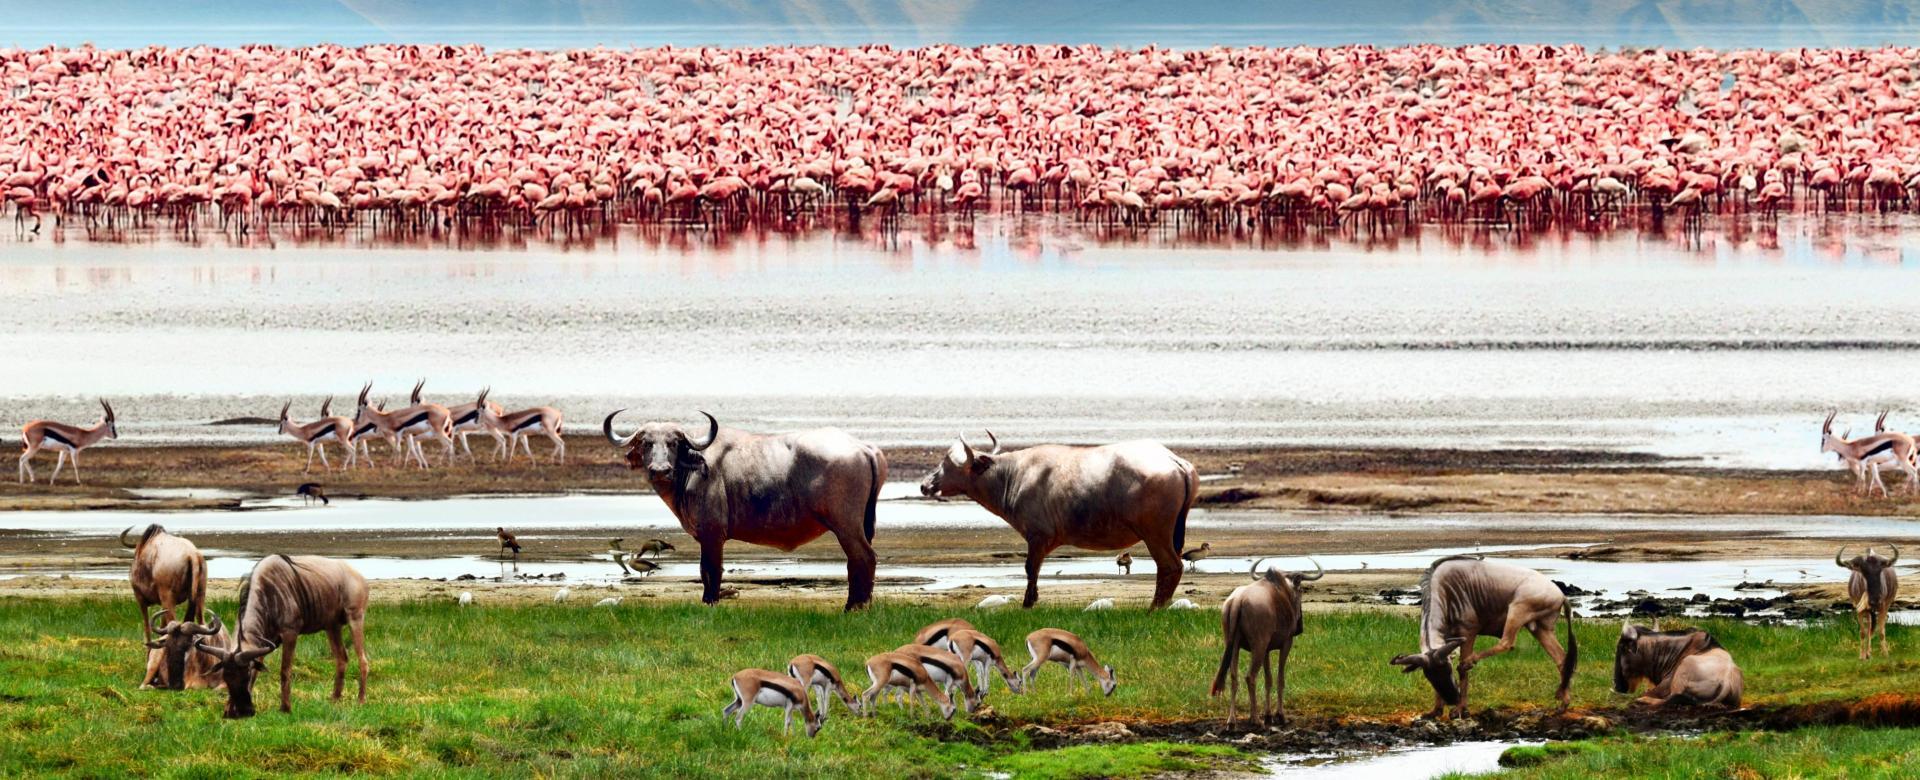 Voyage à pied Tanzanie : Faune de la savane et lagons de zanzibar